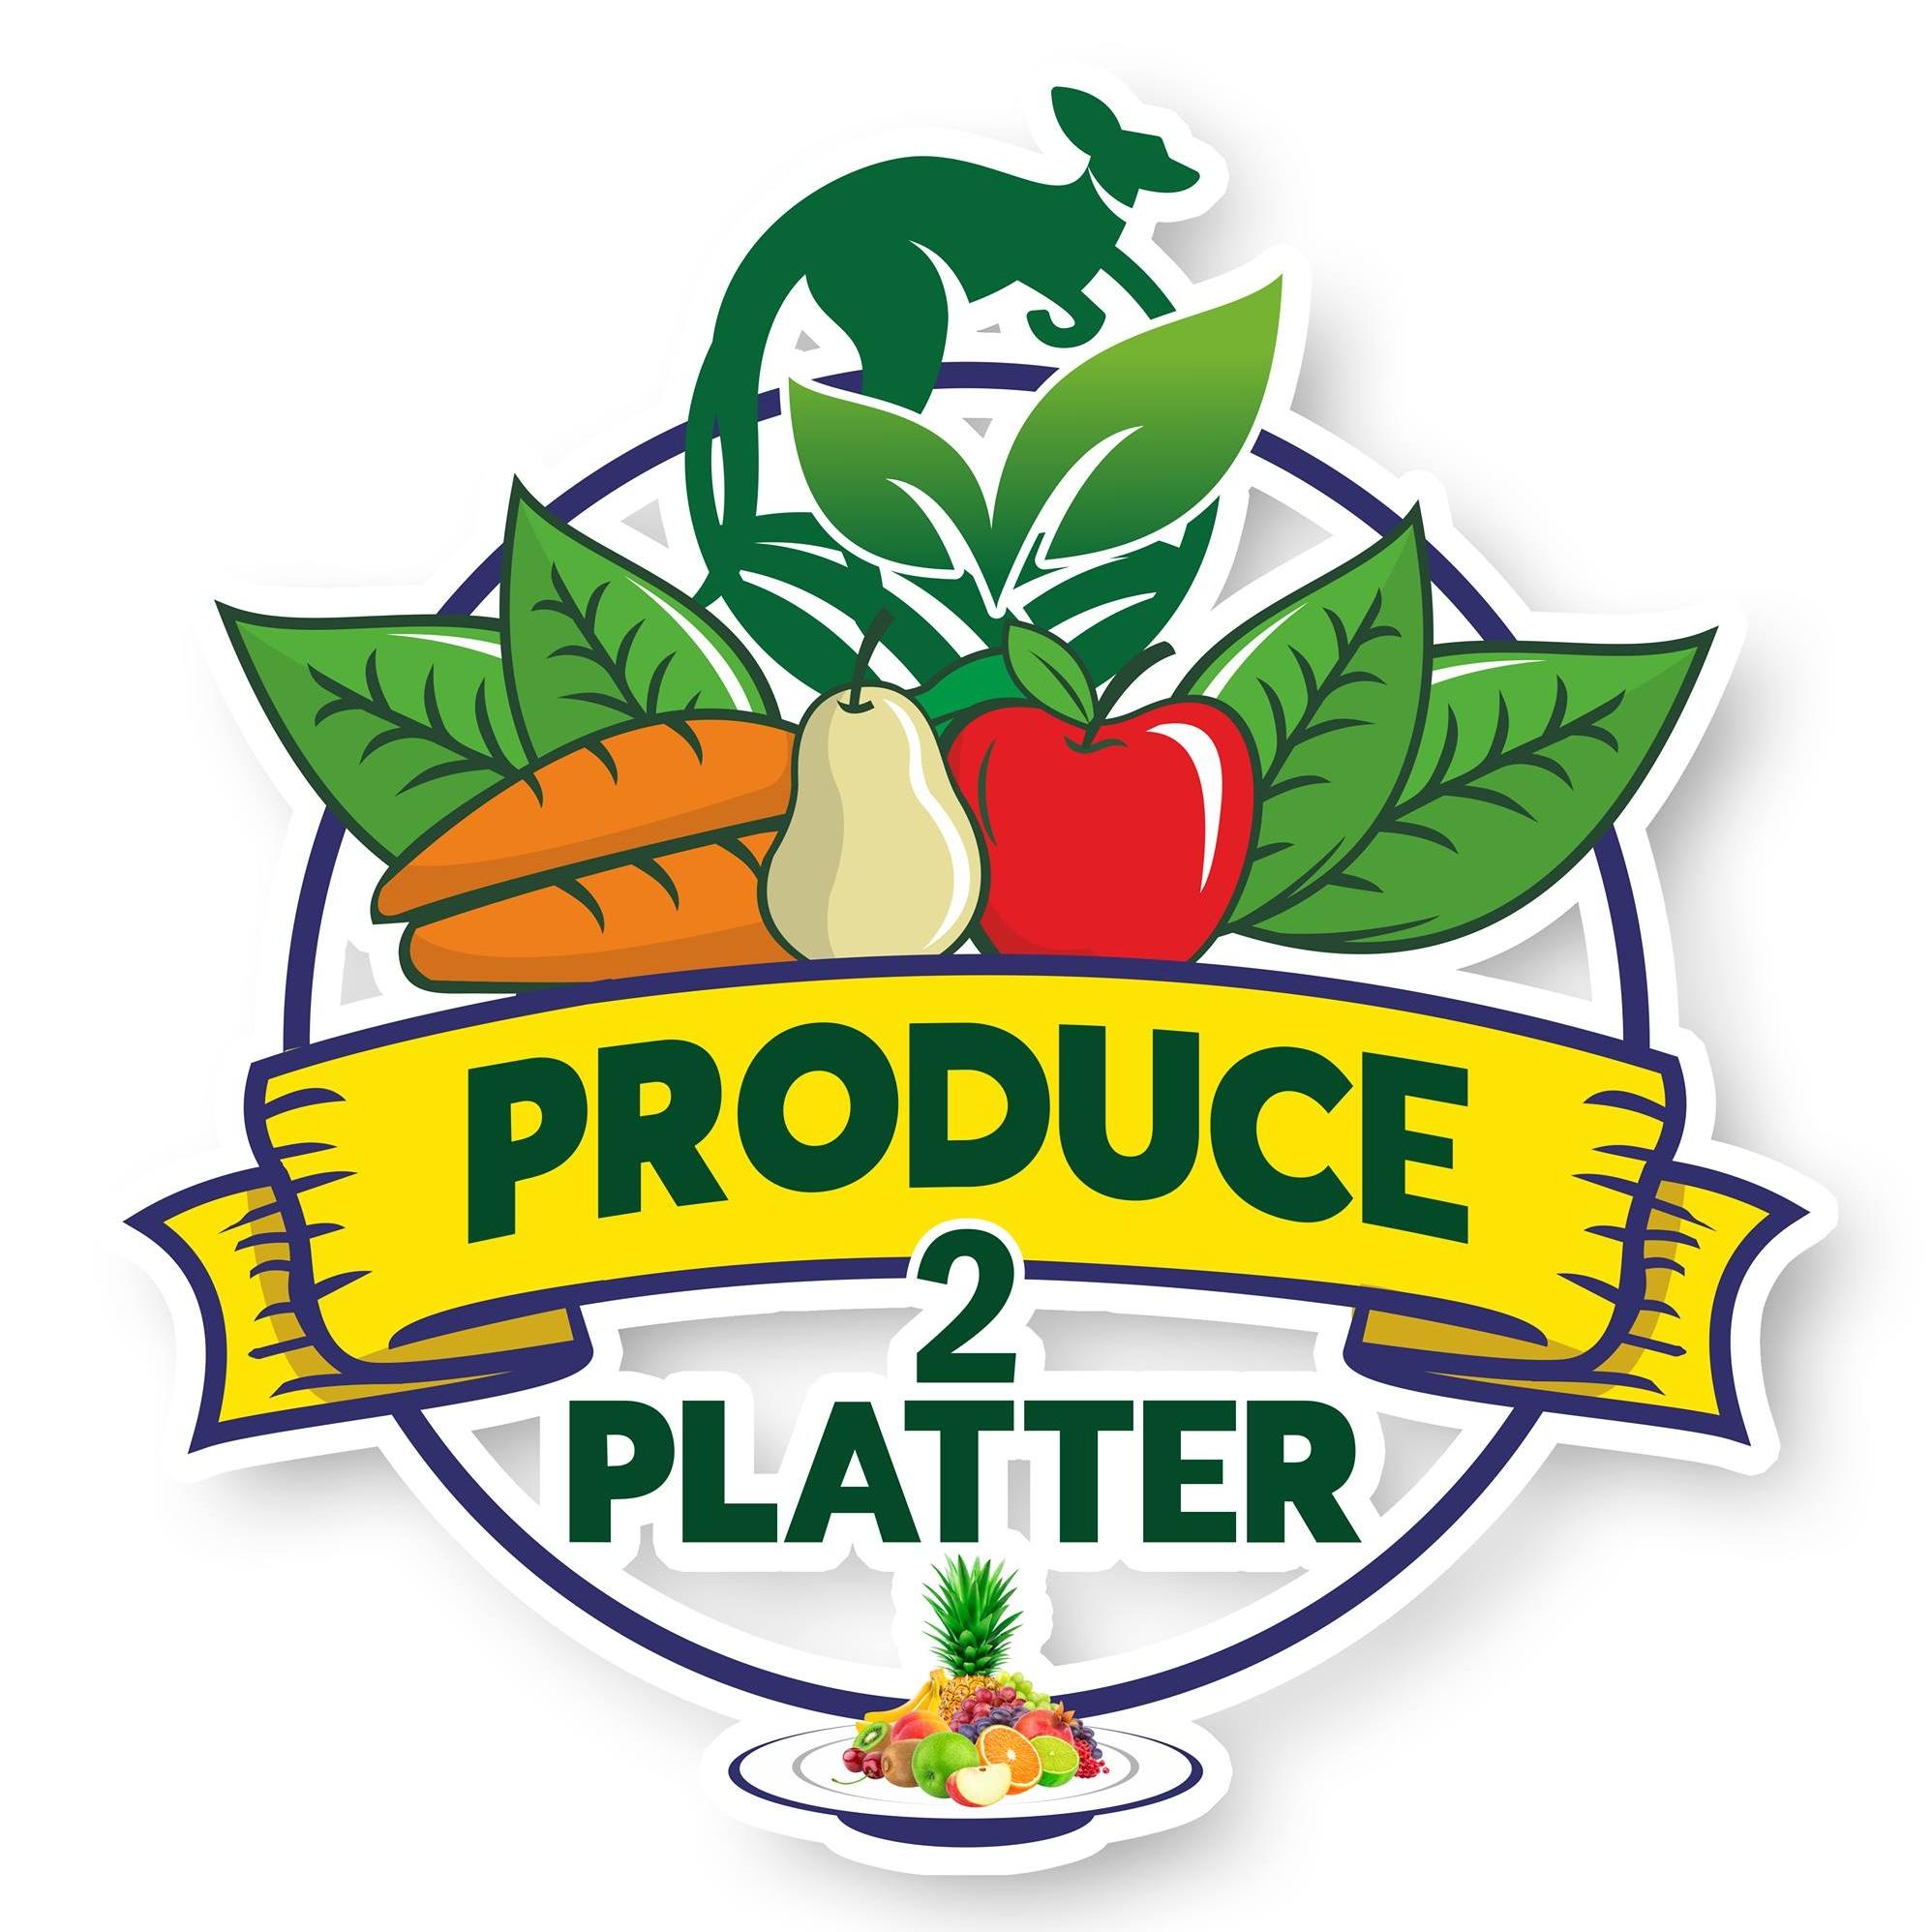 Produce 2 Platter